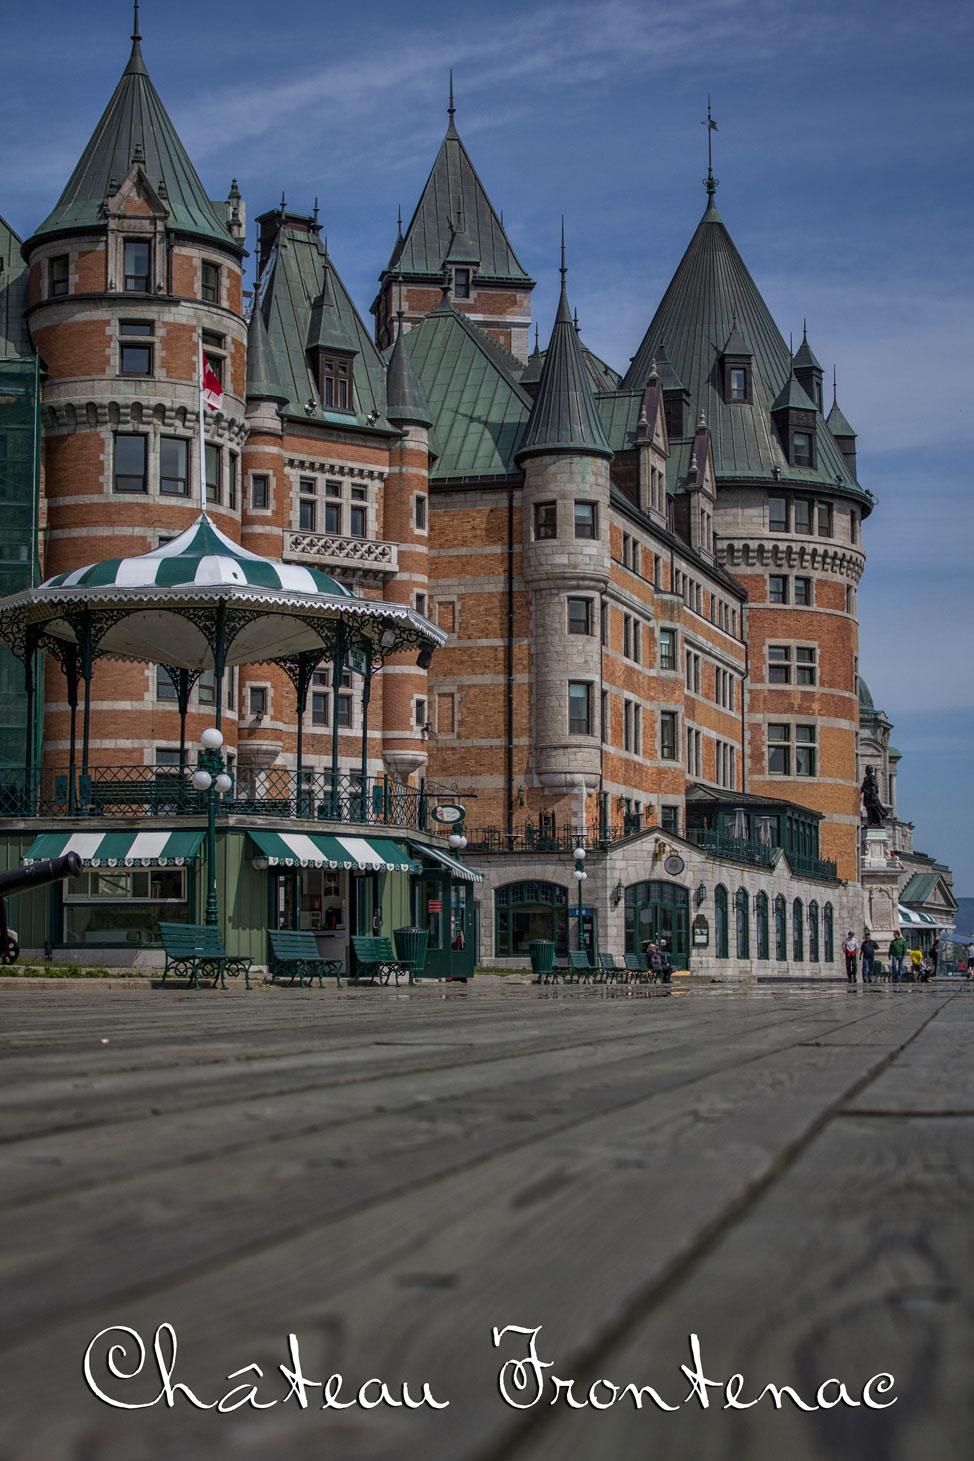 Chateau Frontenac Old Québec